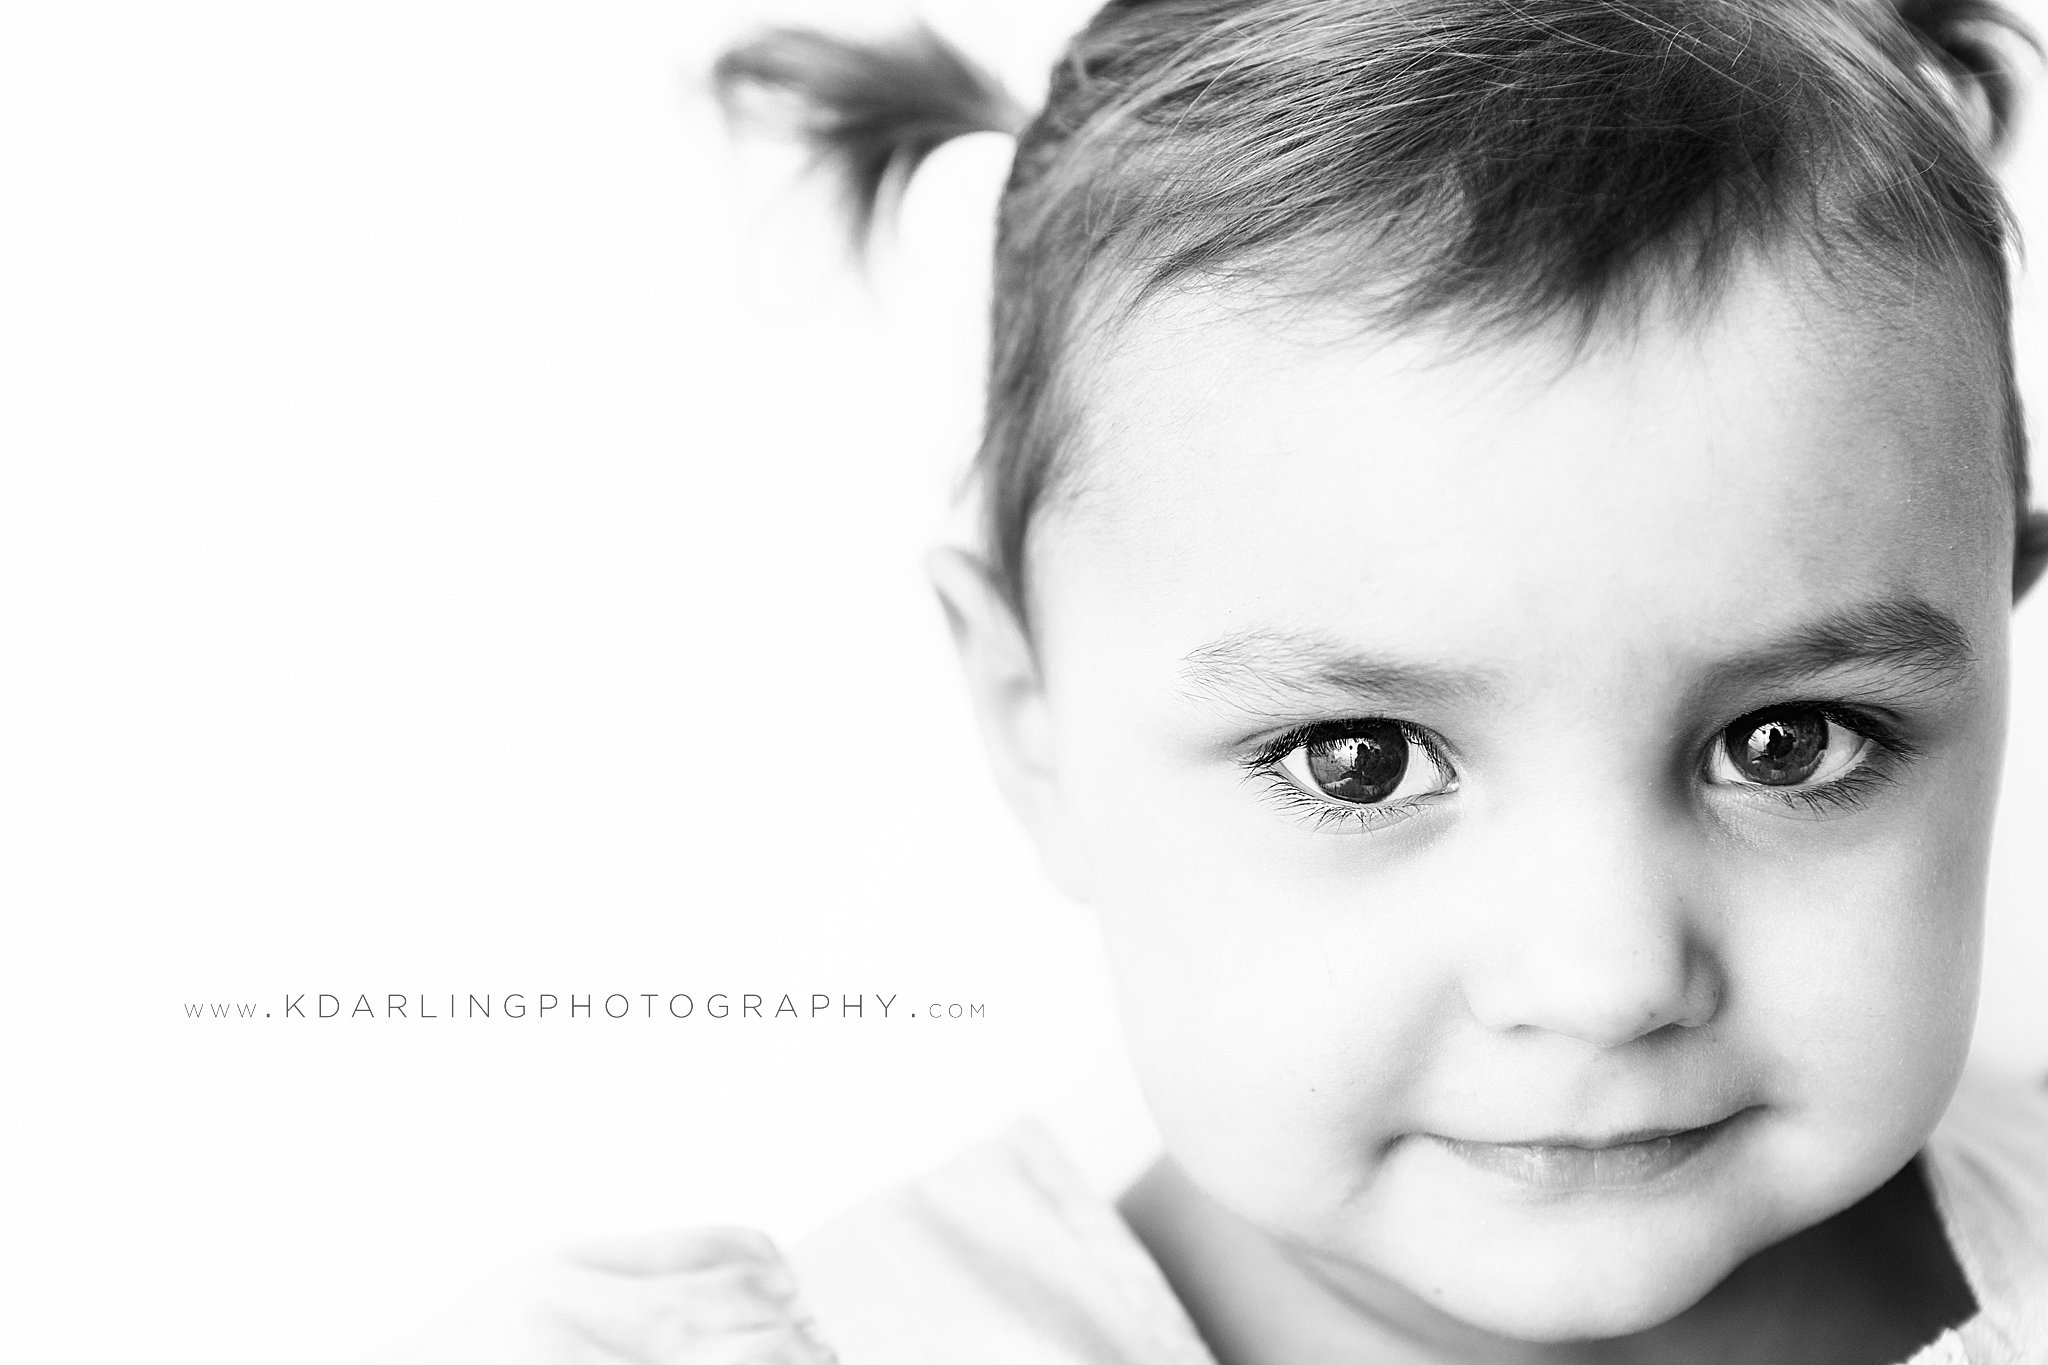 Child-Photographer-portraits-Champaign-County-IL-Fisher-Studio-Darling_0179.jpg